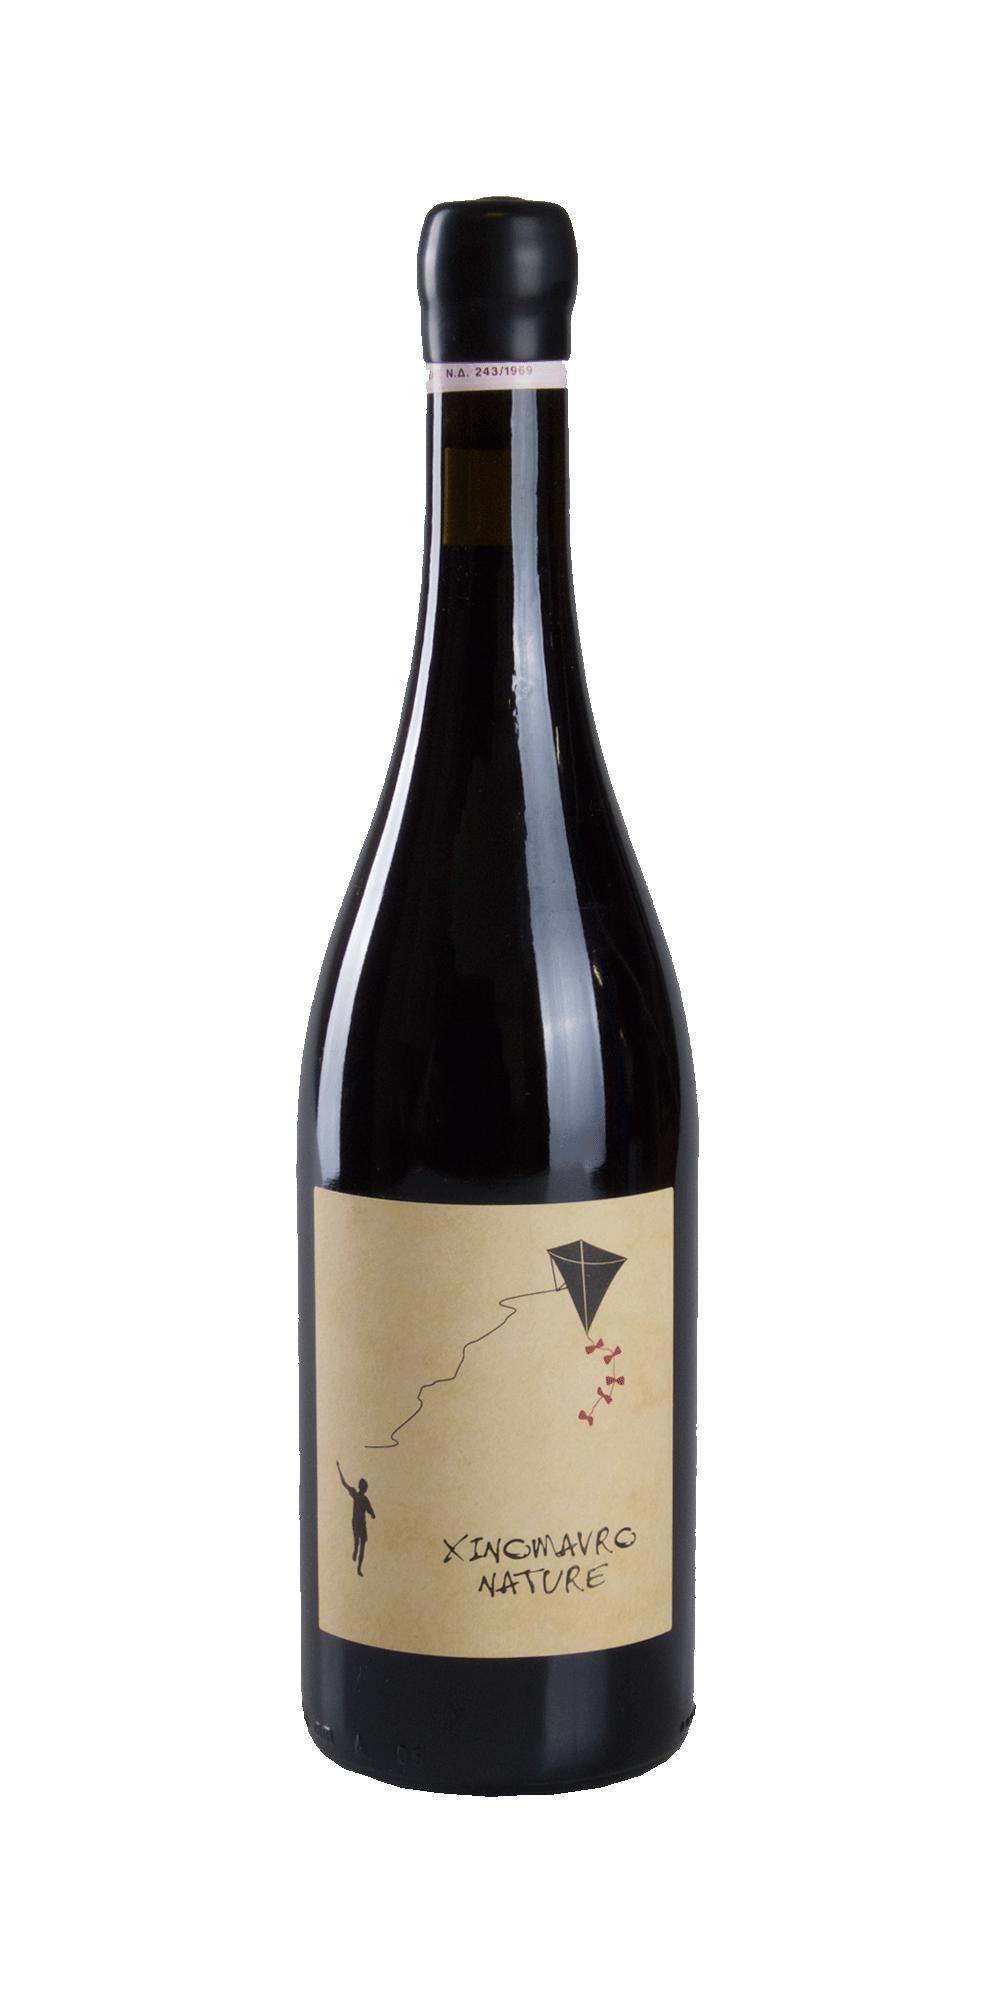 Xinomavro Natur 2019 - Thymiopoulos Vineyards